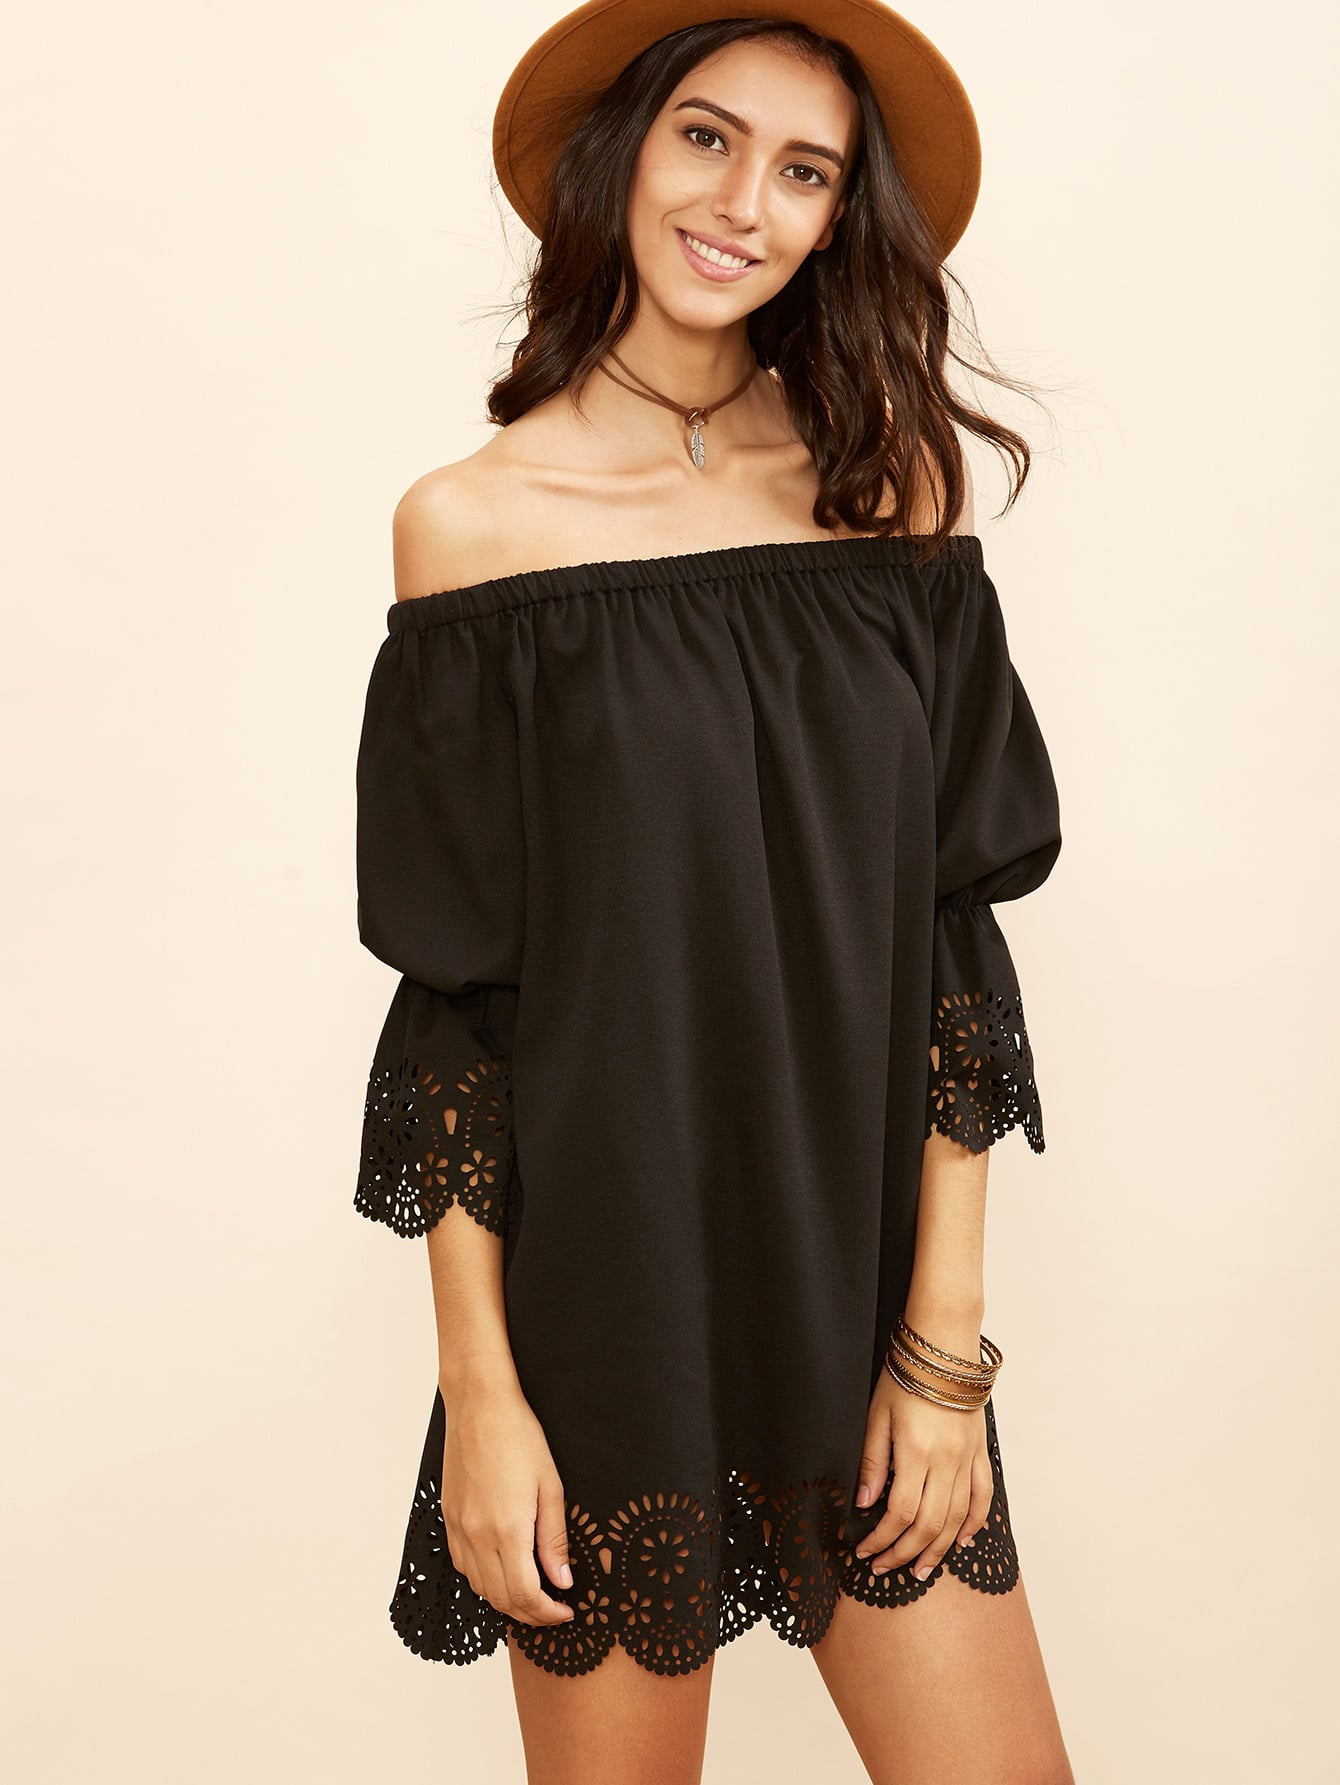 Black Laser Cutout Off The Shoulder Scallop Dress dress160901506